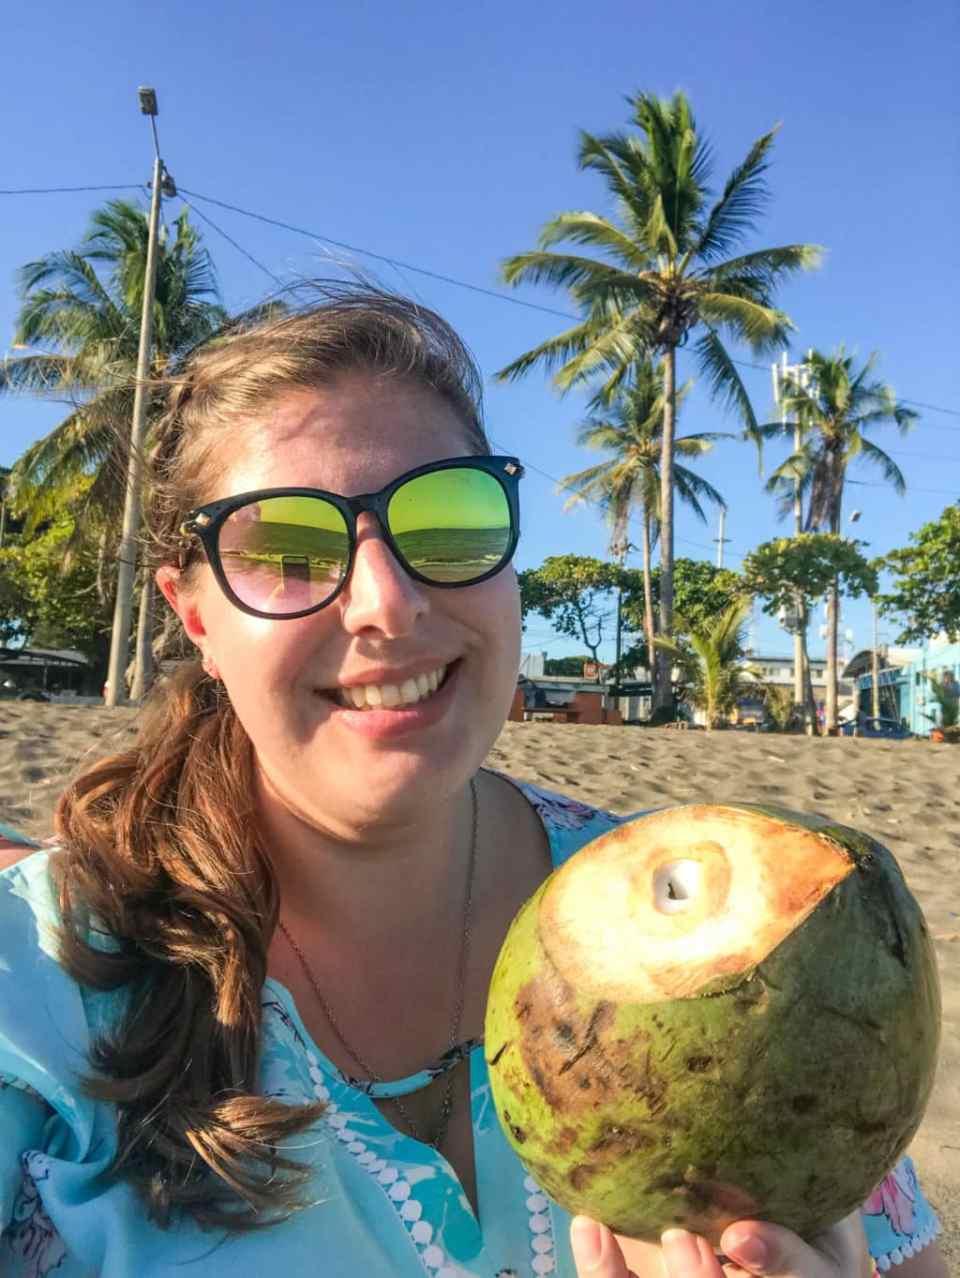 Holding a coconut in Costa Rica